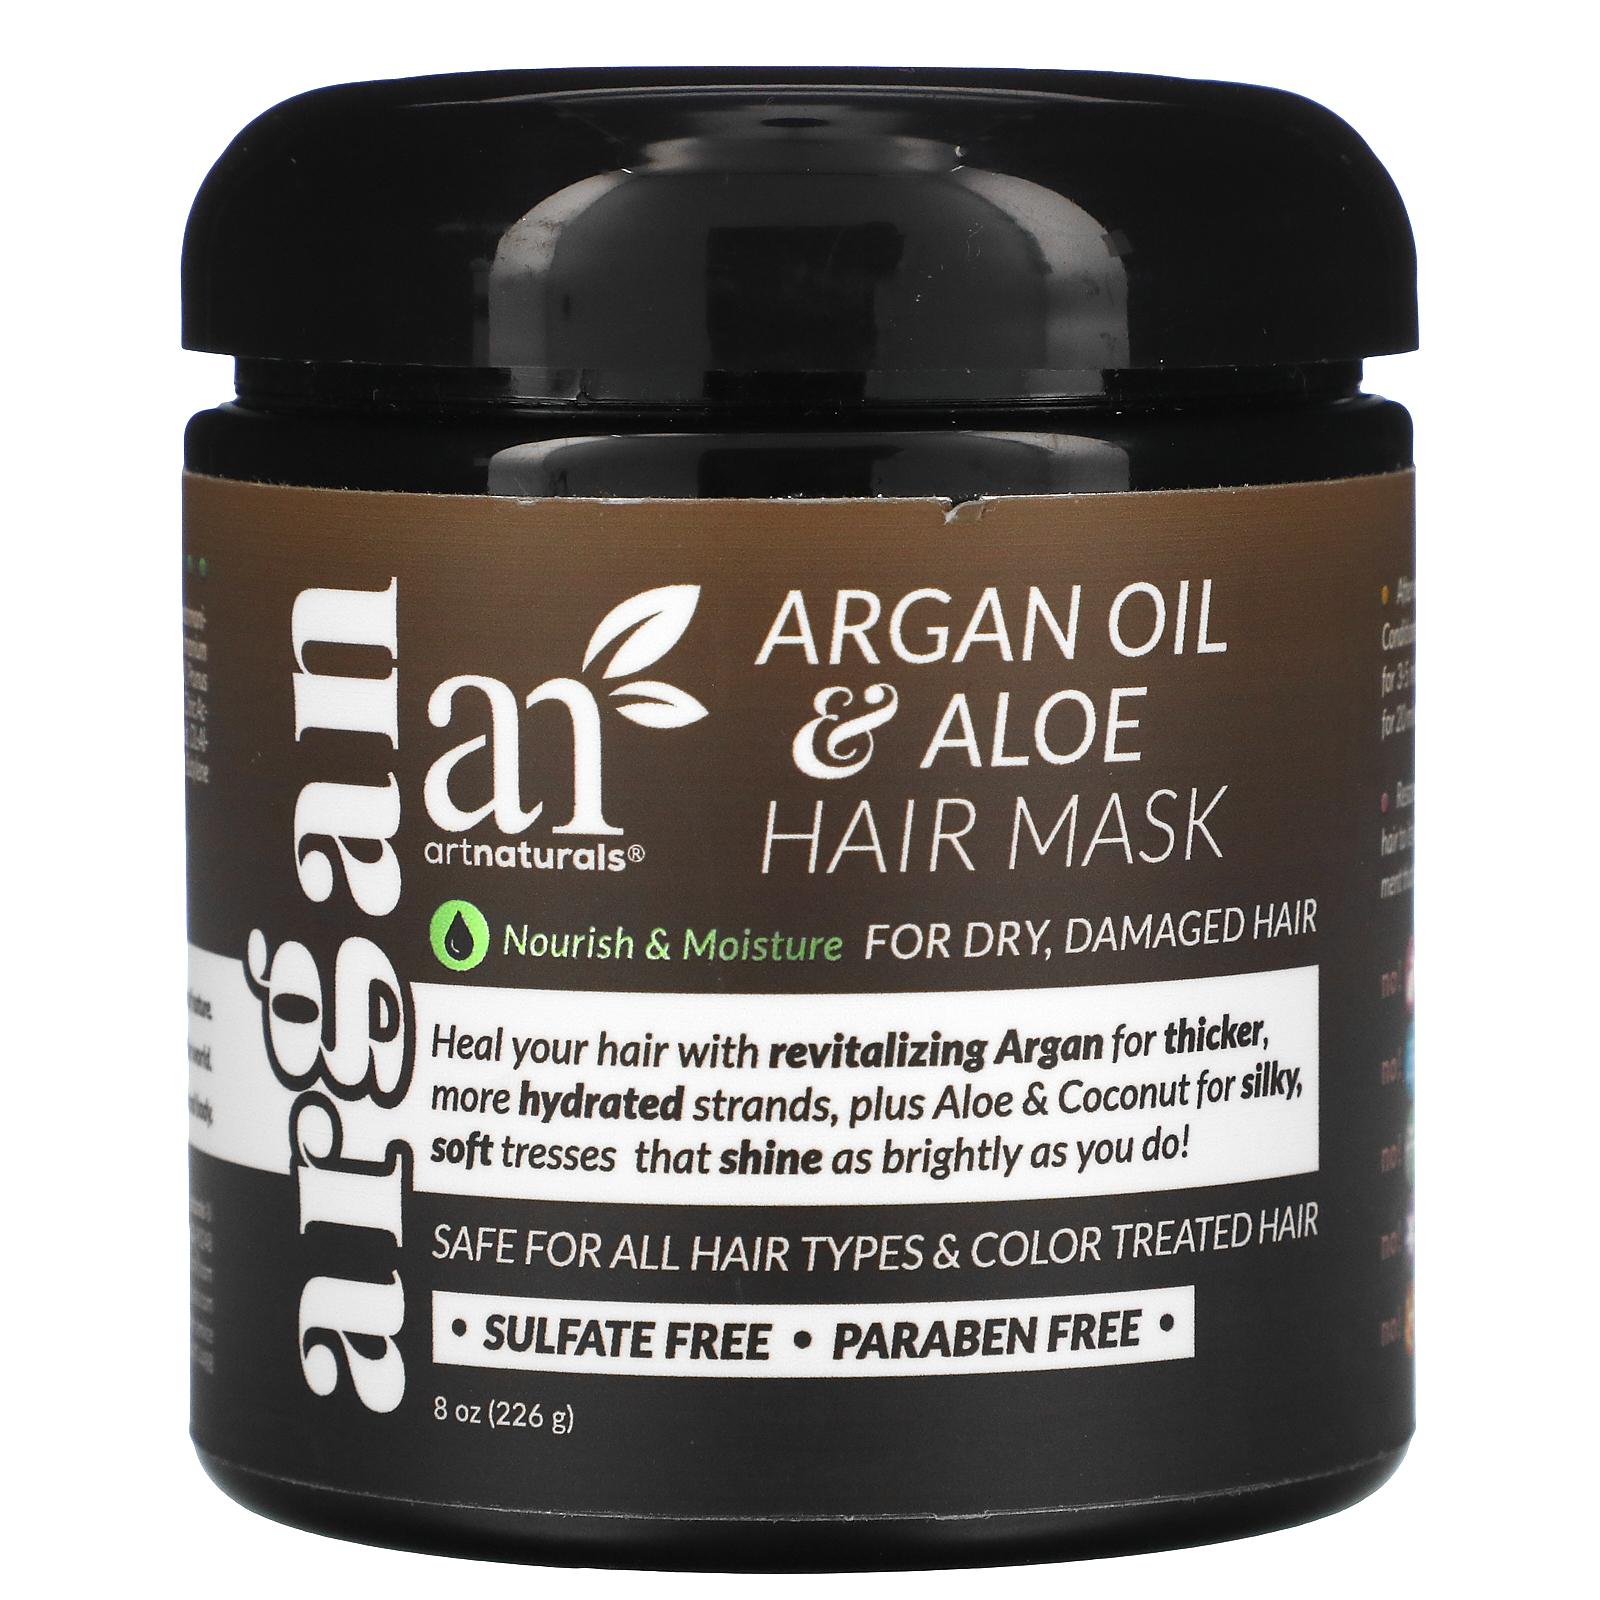 Iherb Argan Oil